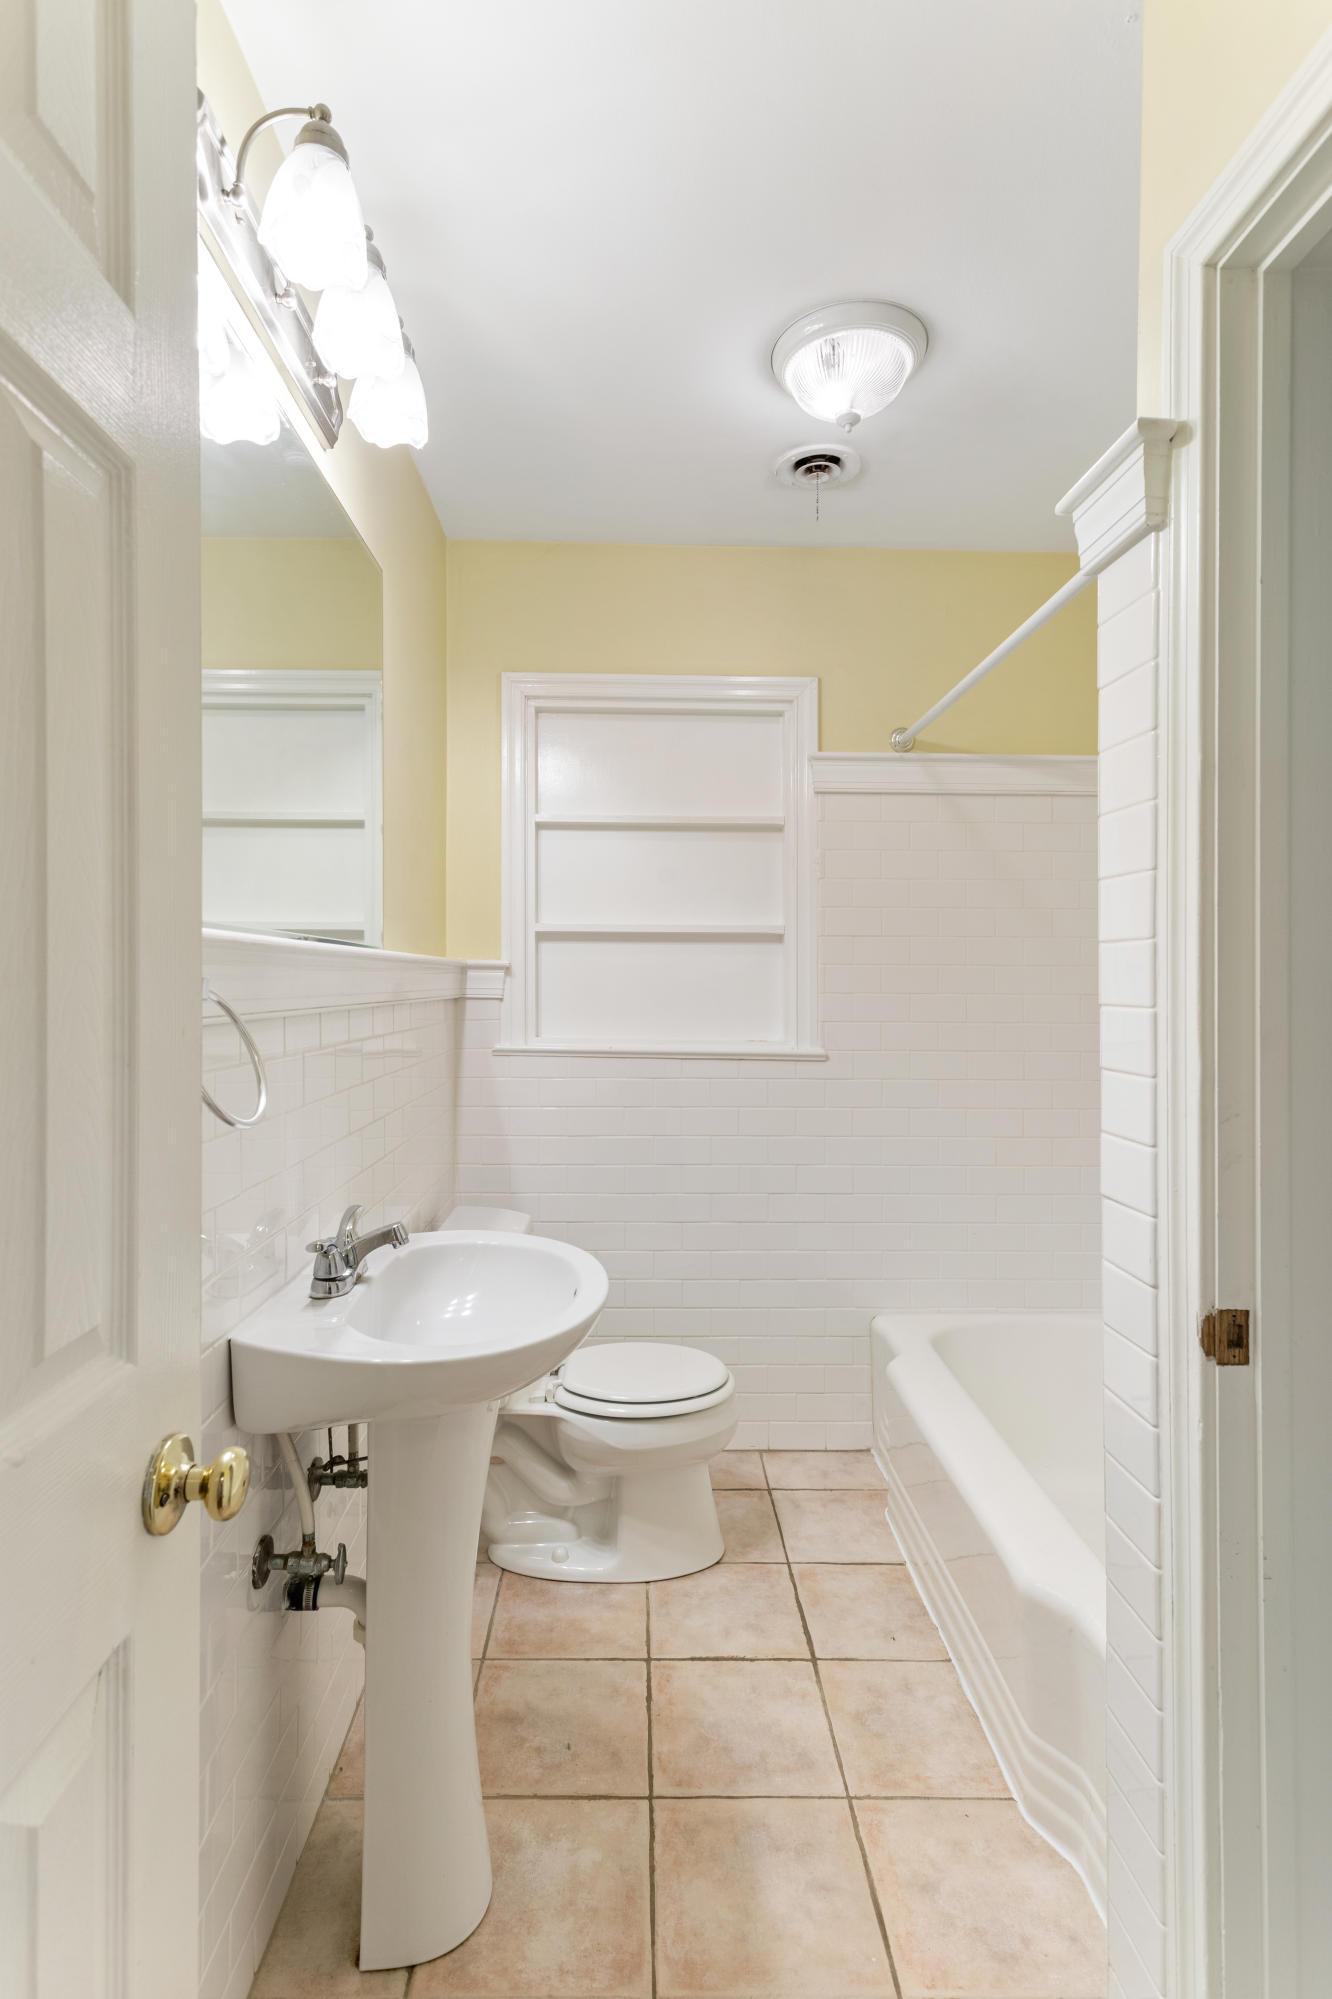 Dogwood Park Homes For Sale - 437 Cheves, Charleston, SC - 16